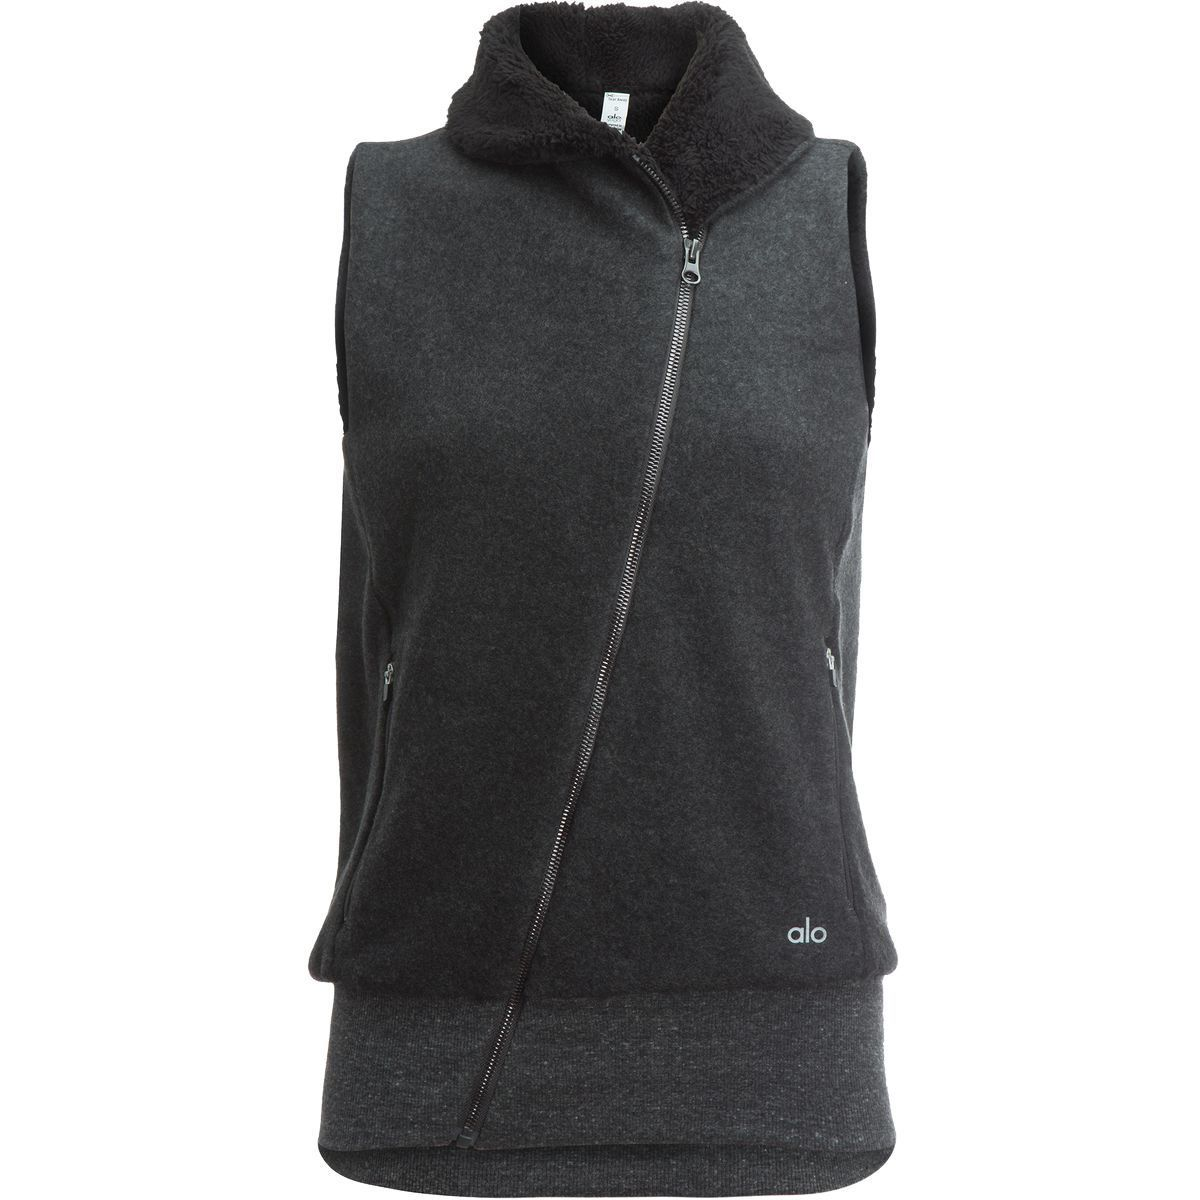 Alo Yoga Flat Iron Vest - Women